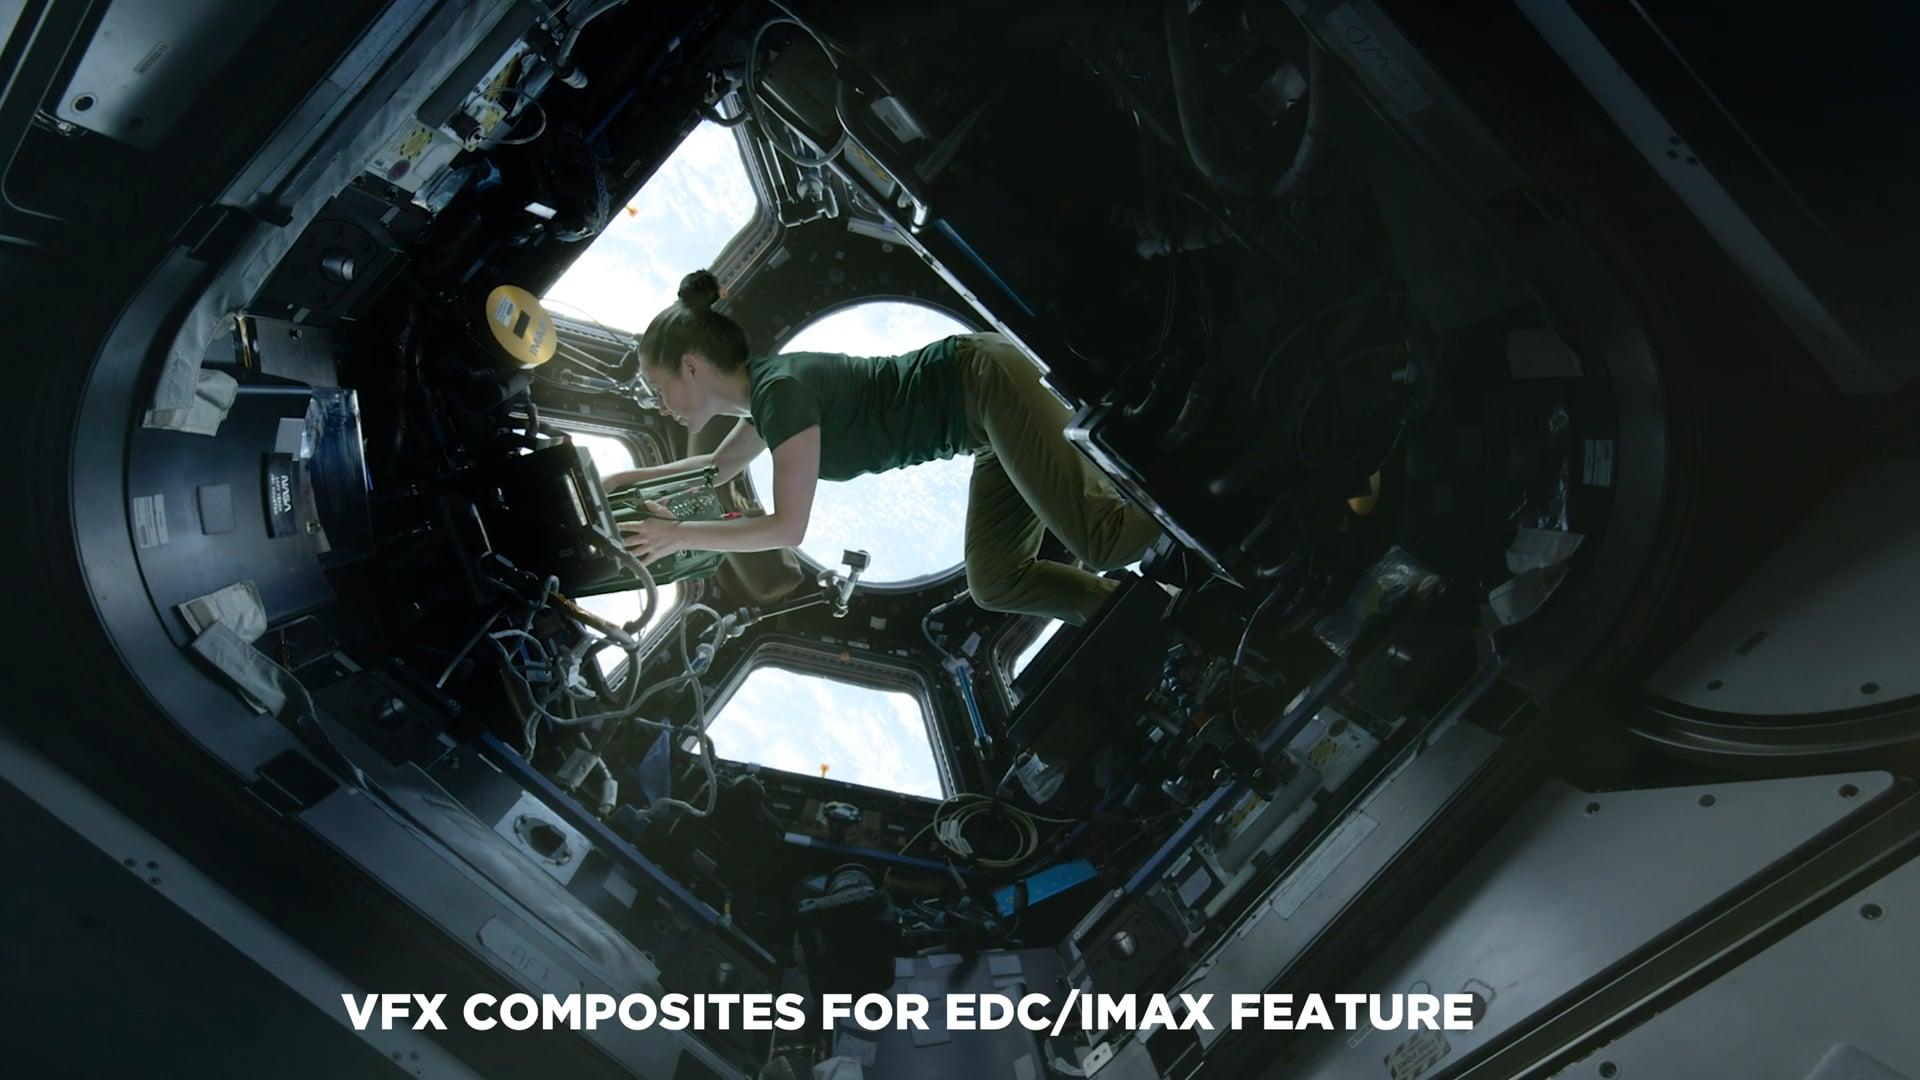 IMAX/EDC VFX MAKING OF